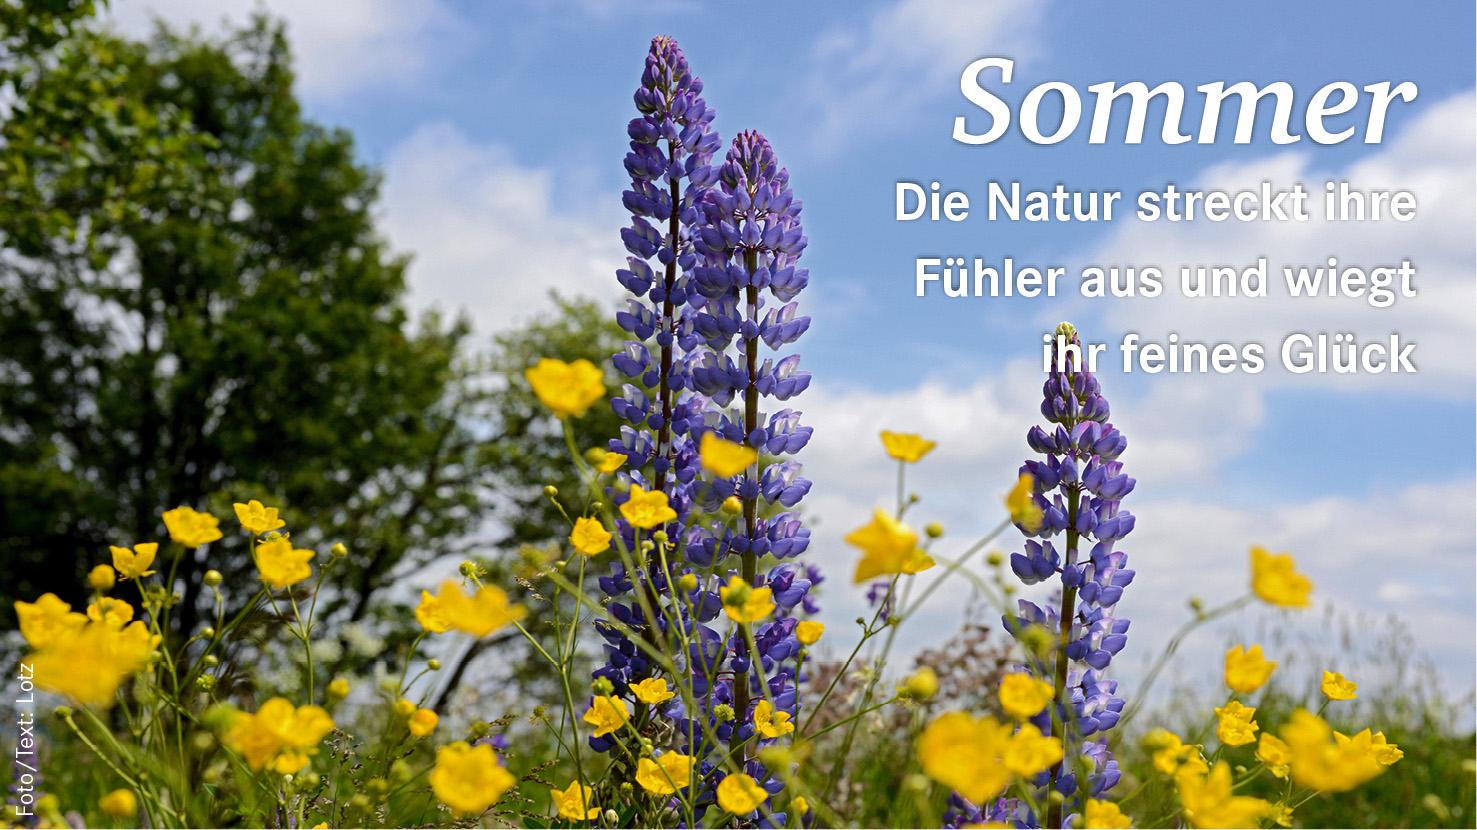 Spruch Sommer 164_3602_rgb